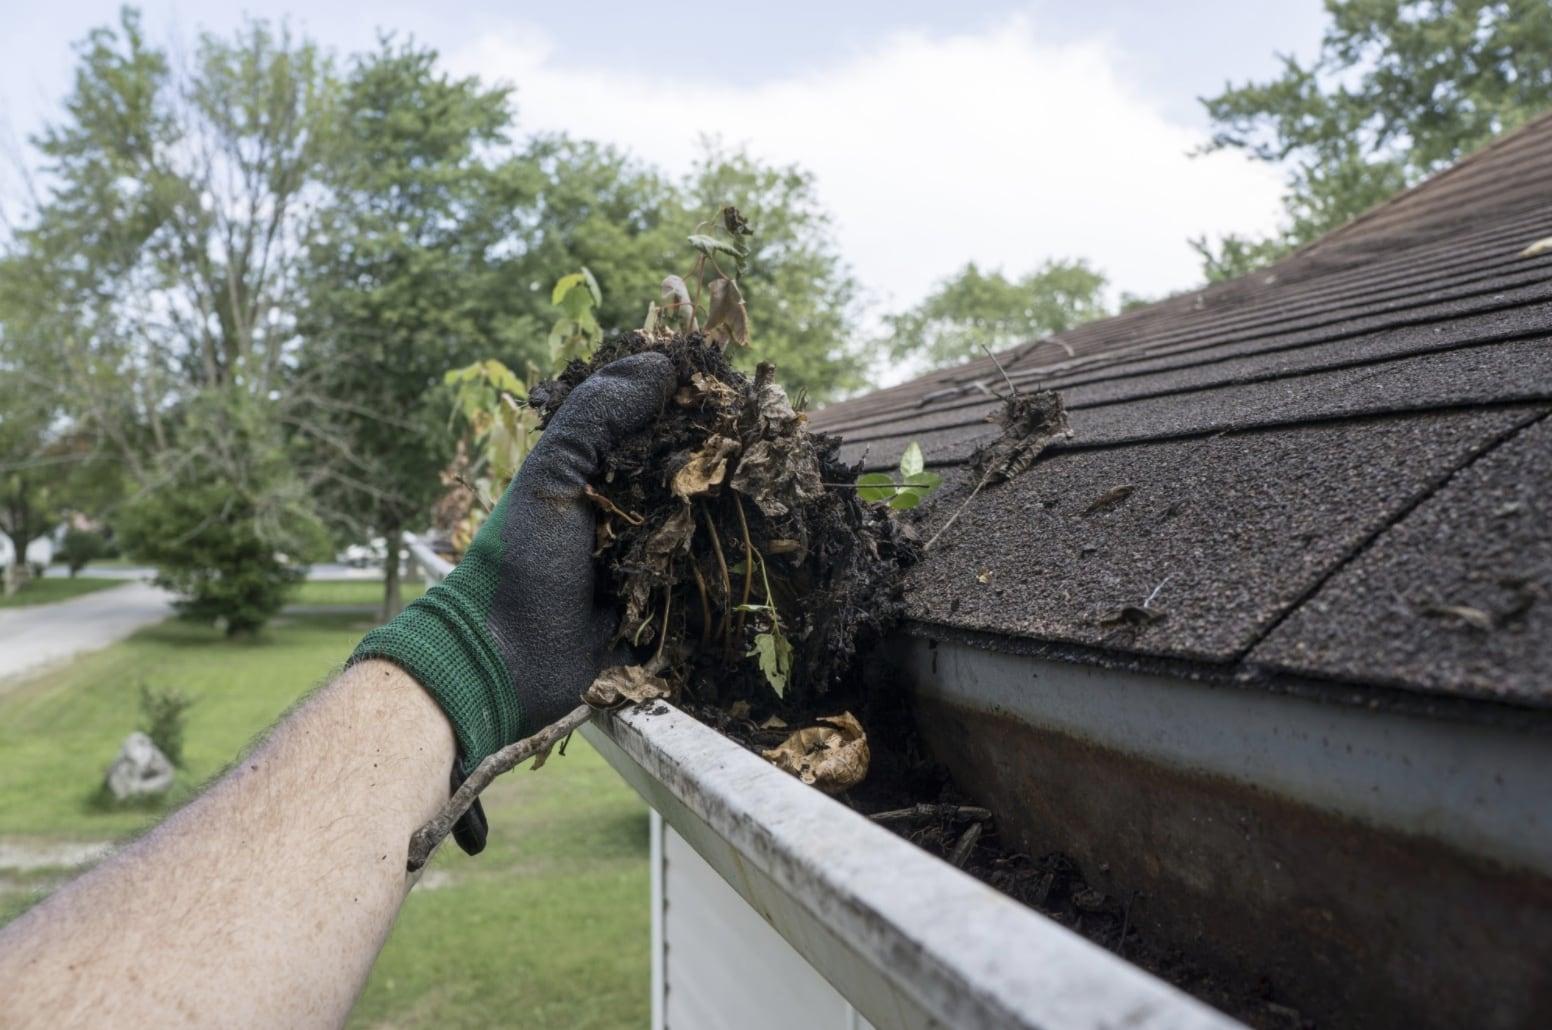 Hand digging debris out of gutter